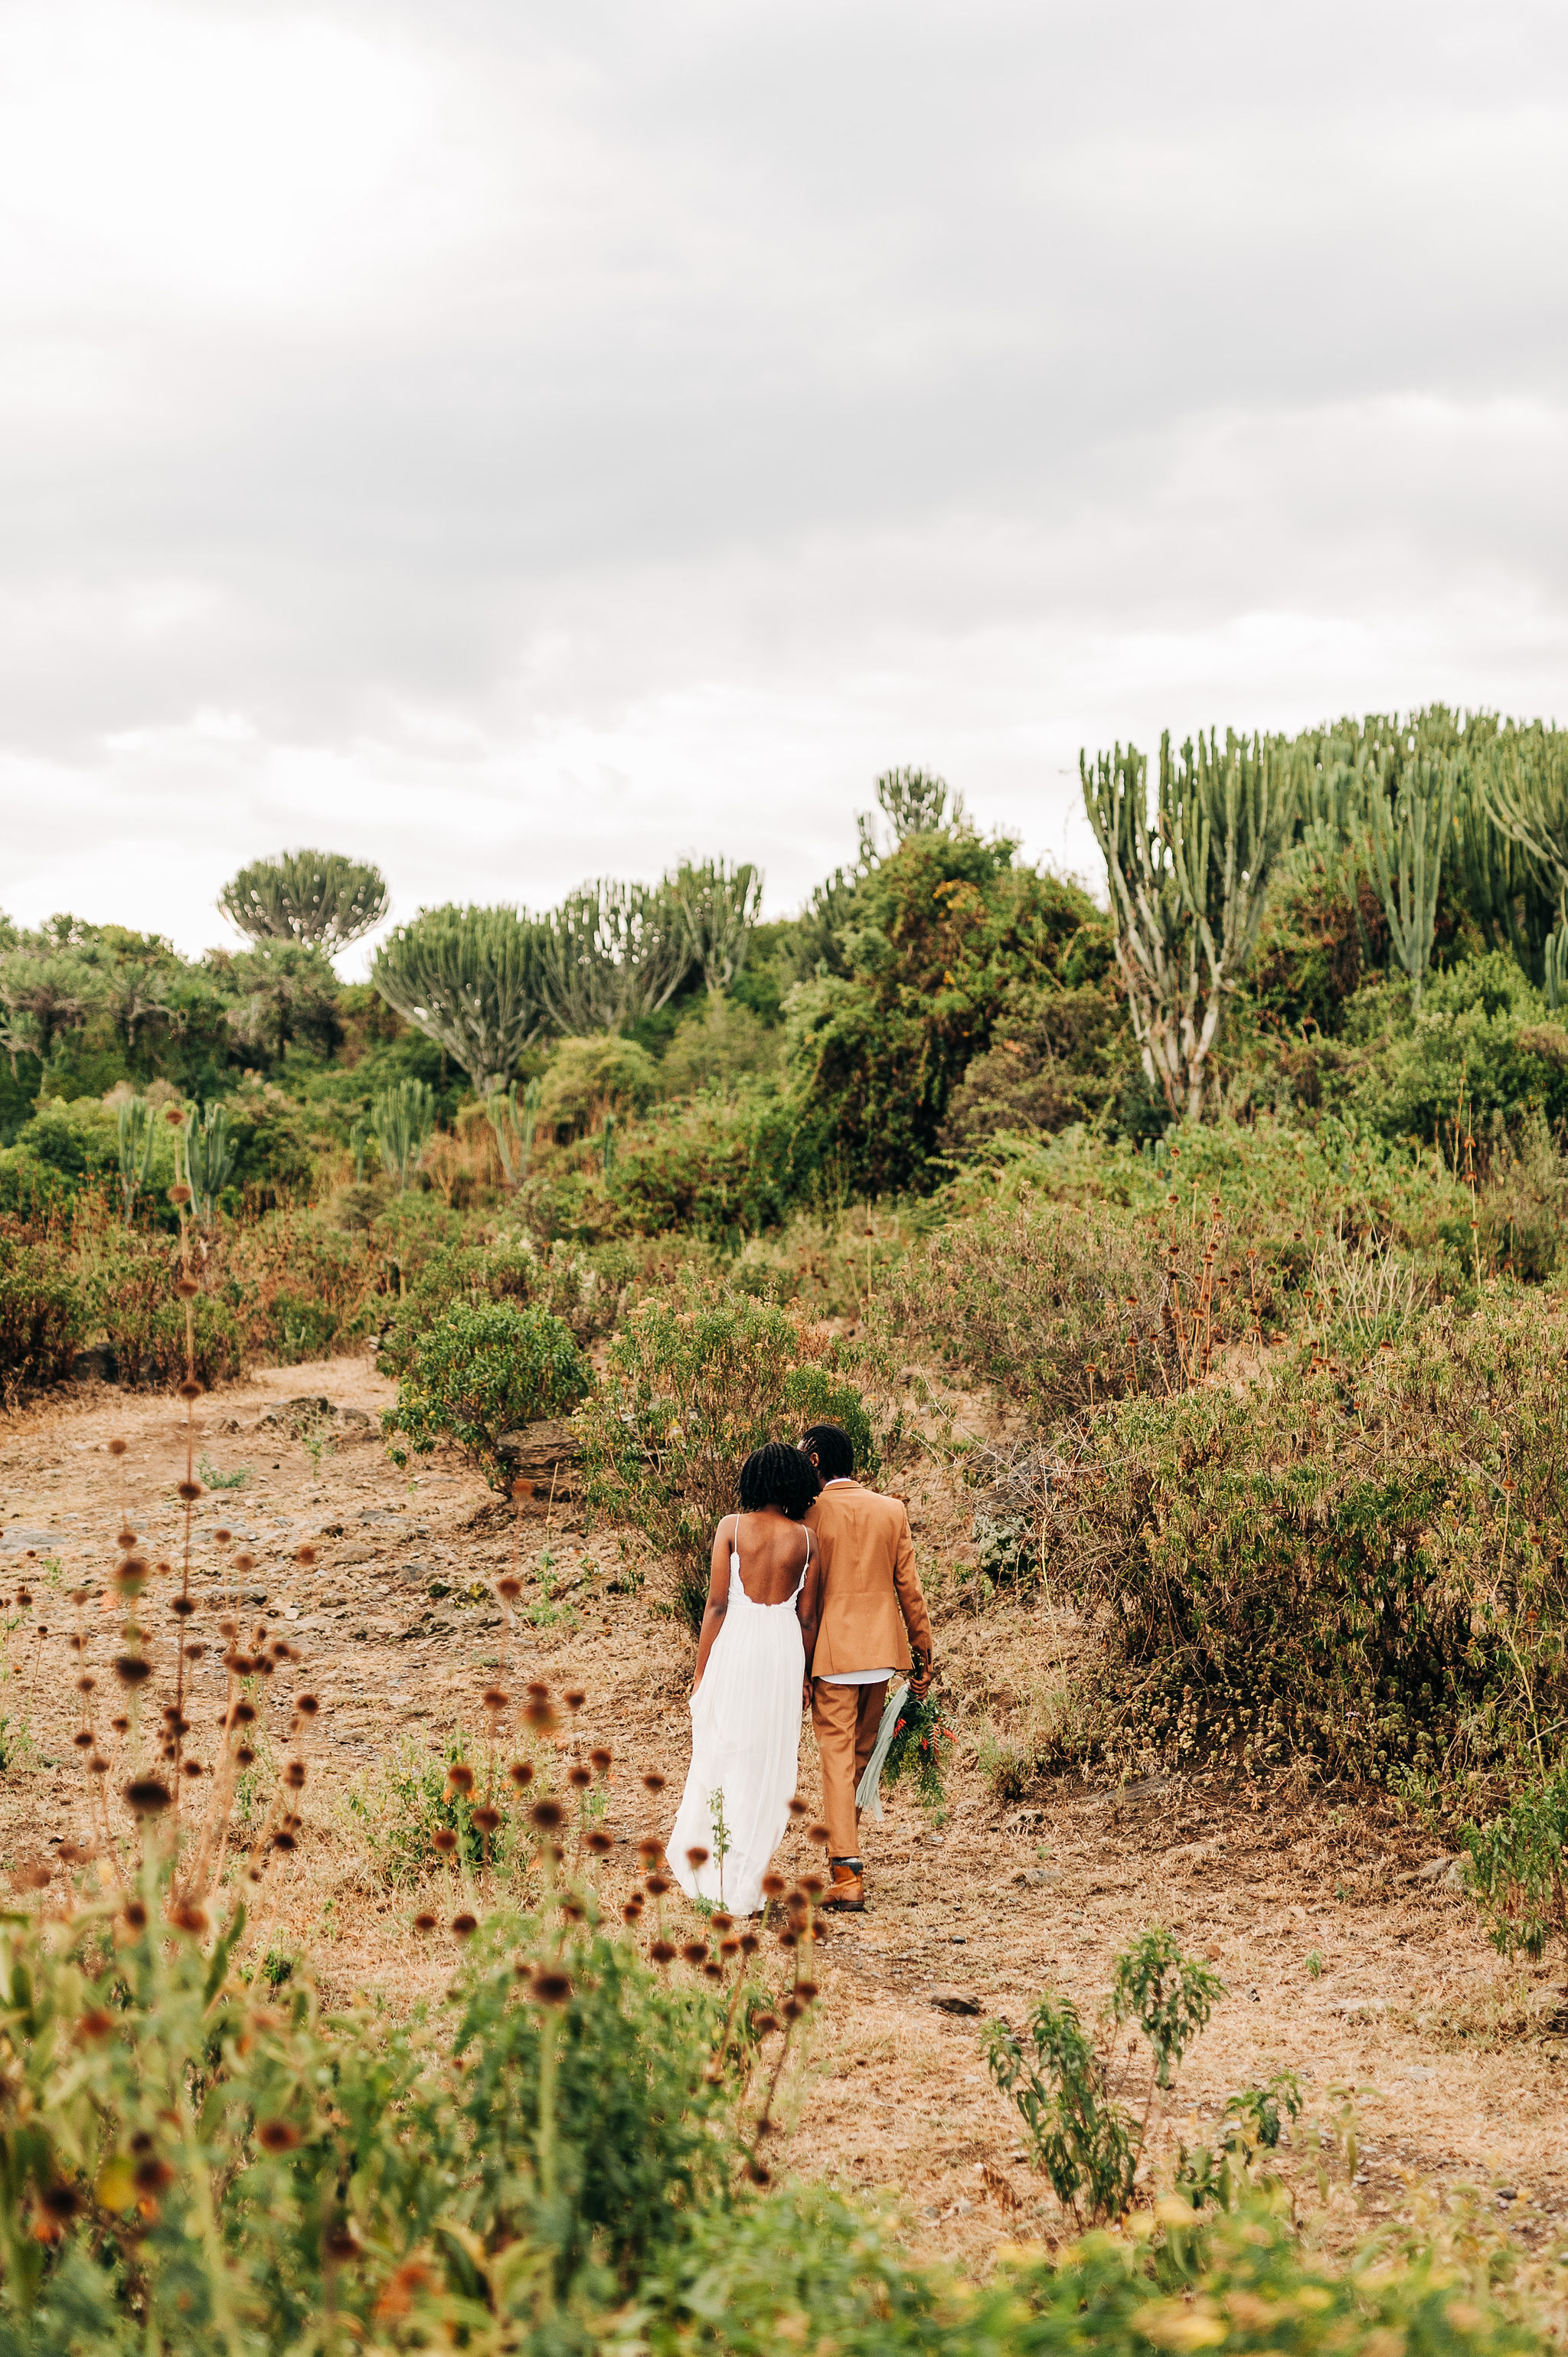 Anna-Hari-Photography-Destination-Wedding-Photographer-Kenya-101.jpg